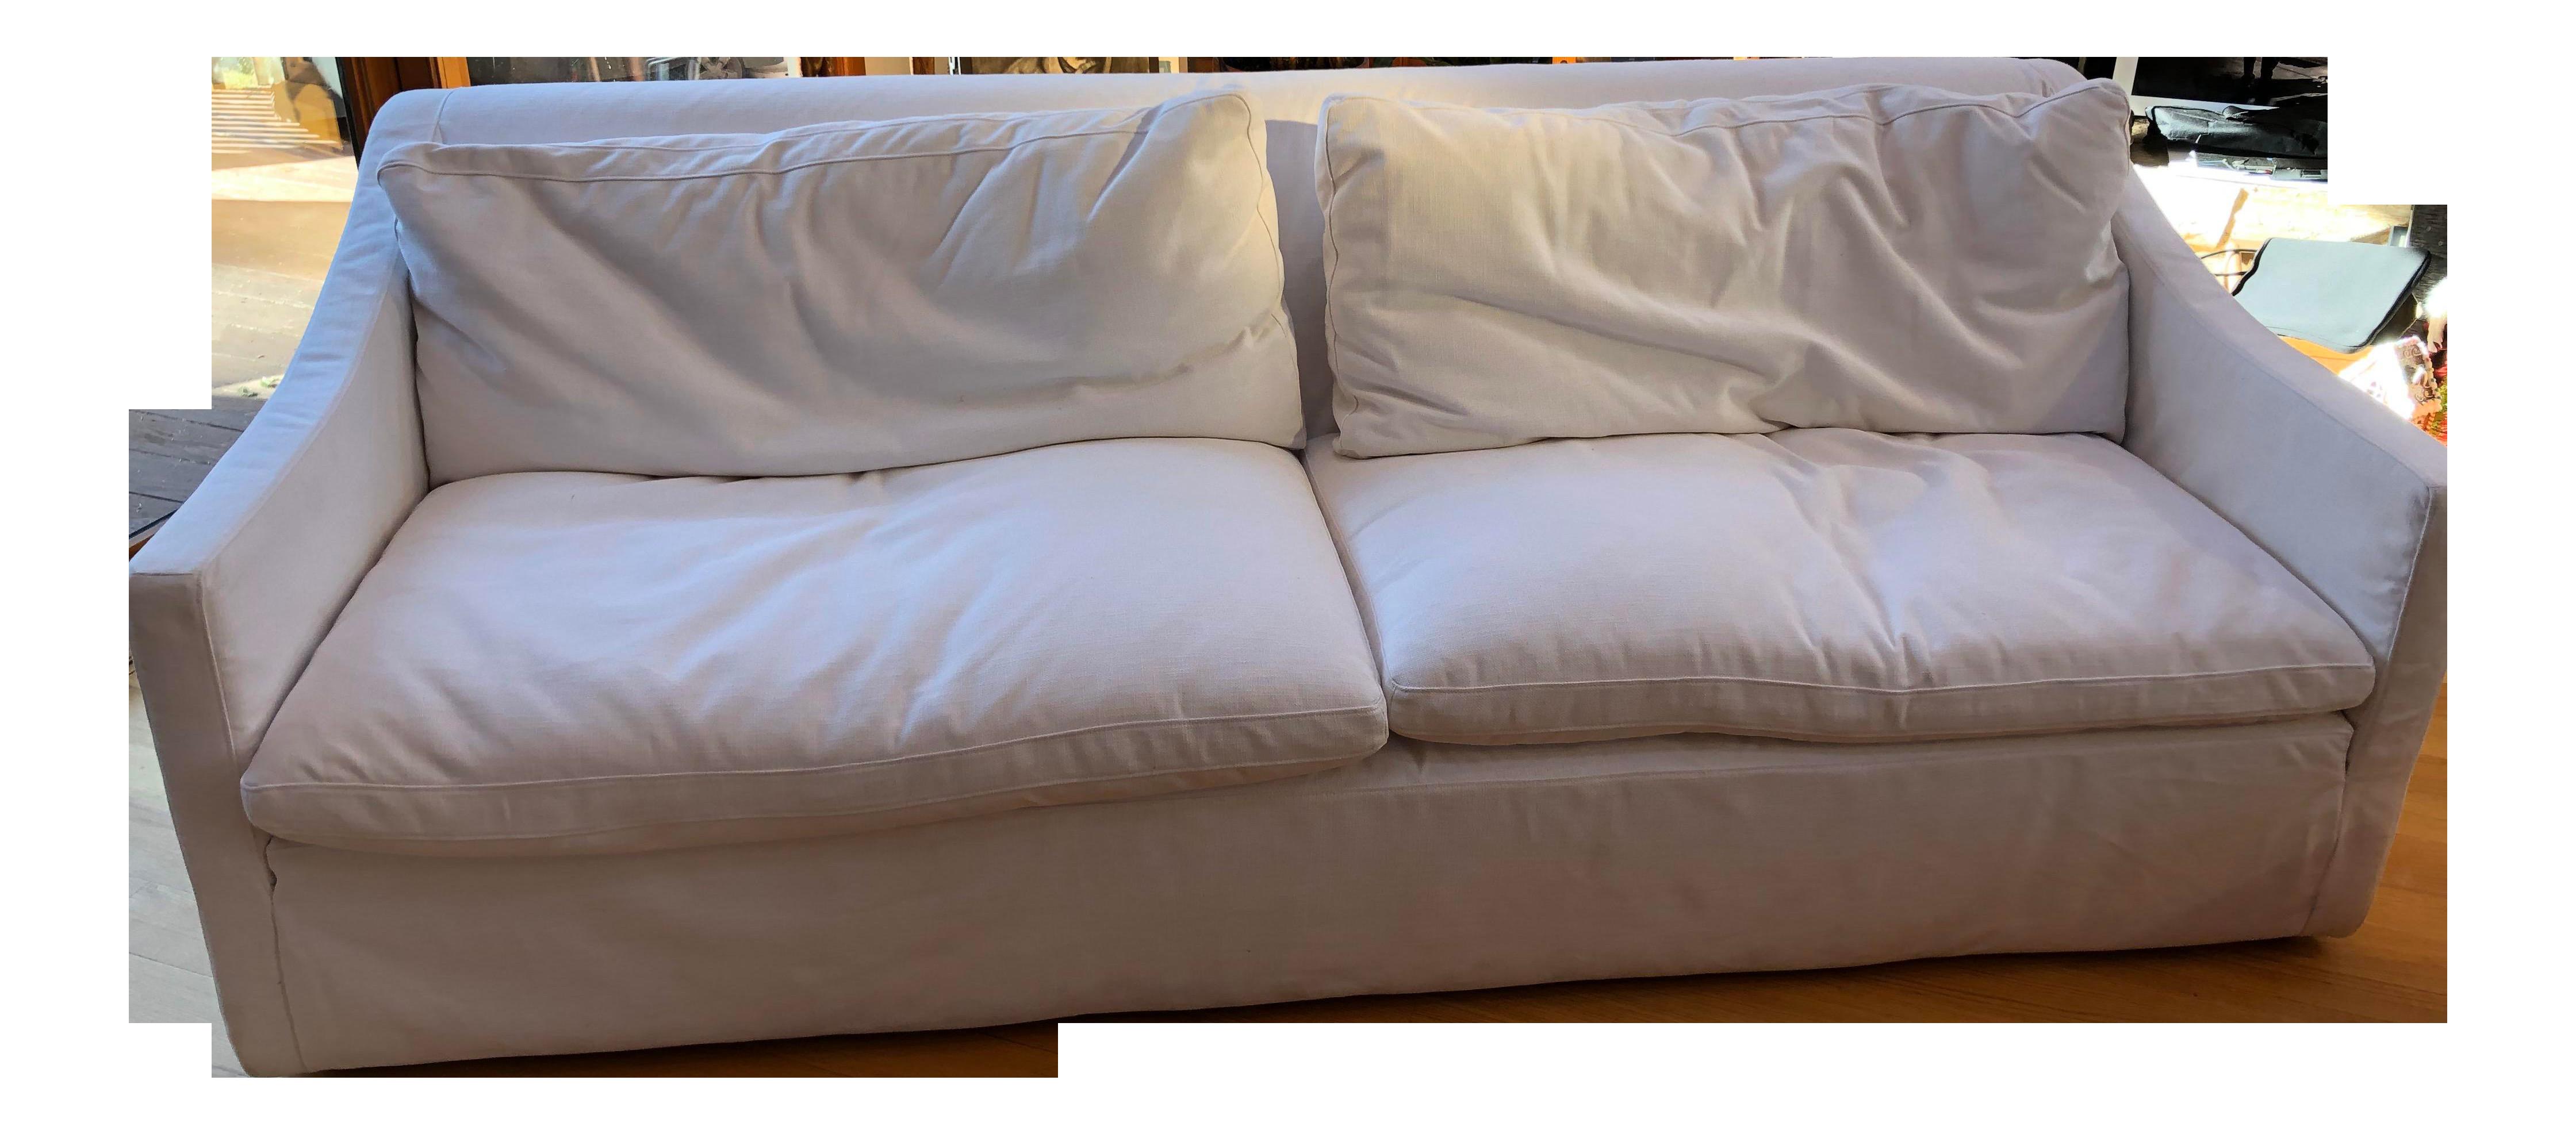 Furniture St Cloud Mn Craigslist   AdinaPorter